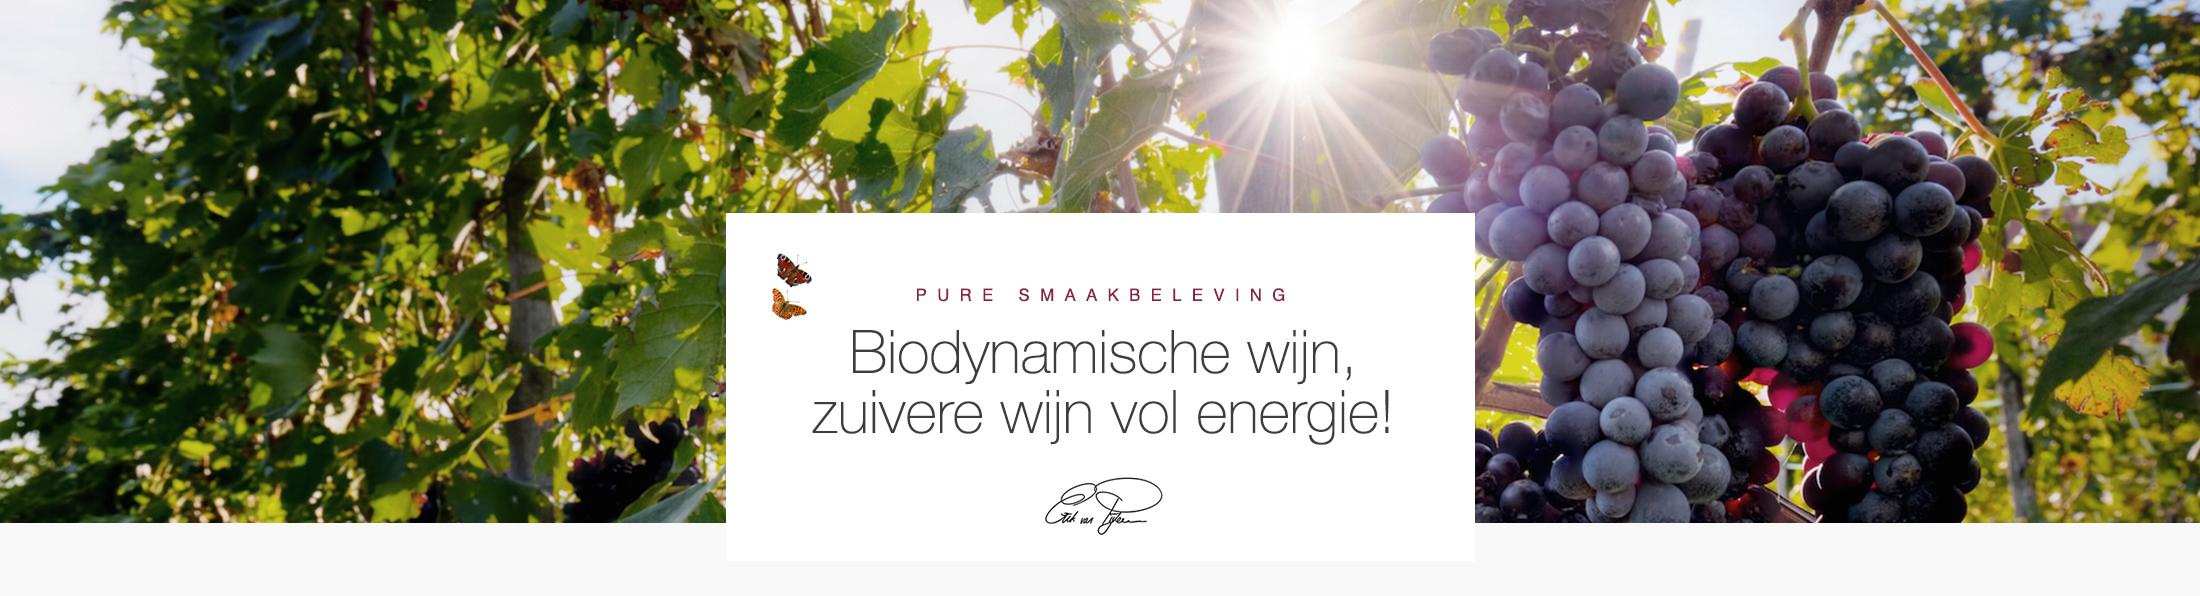 Biodynamische Wijn - Homepage